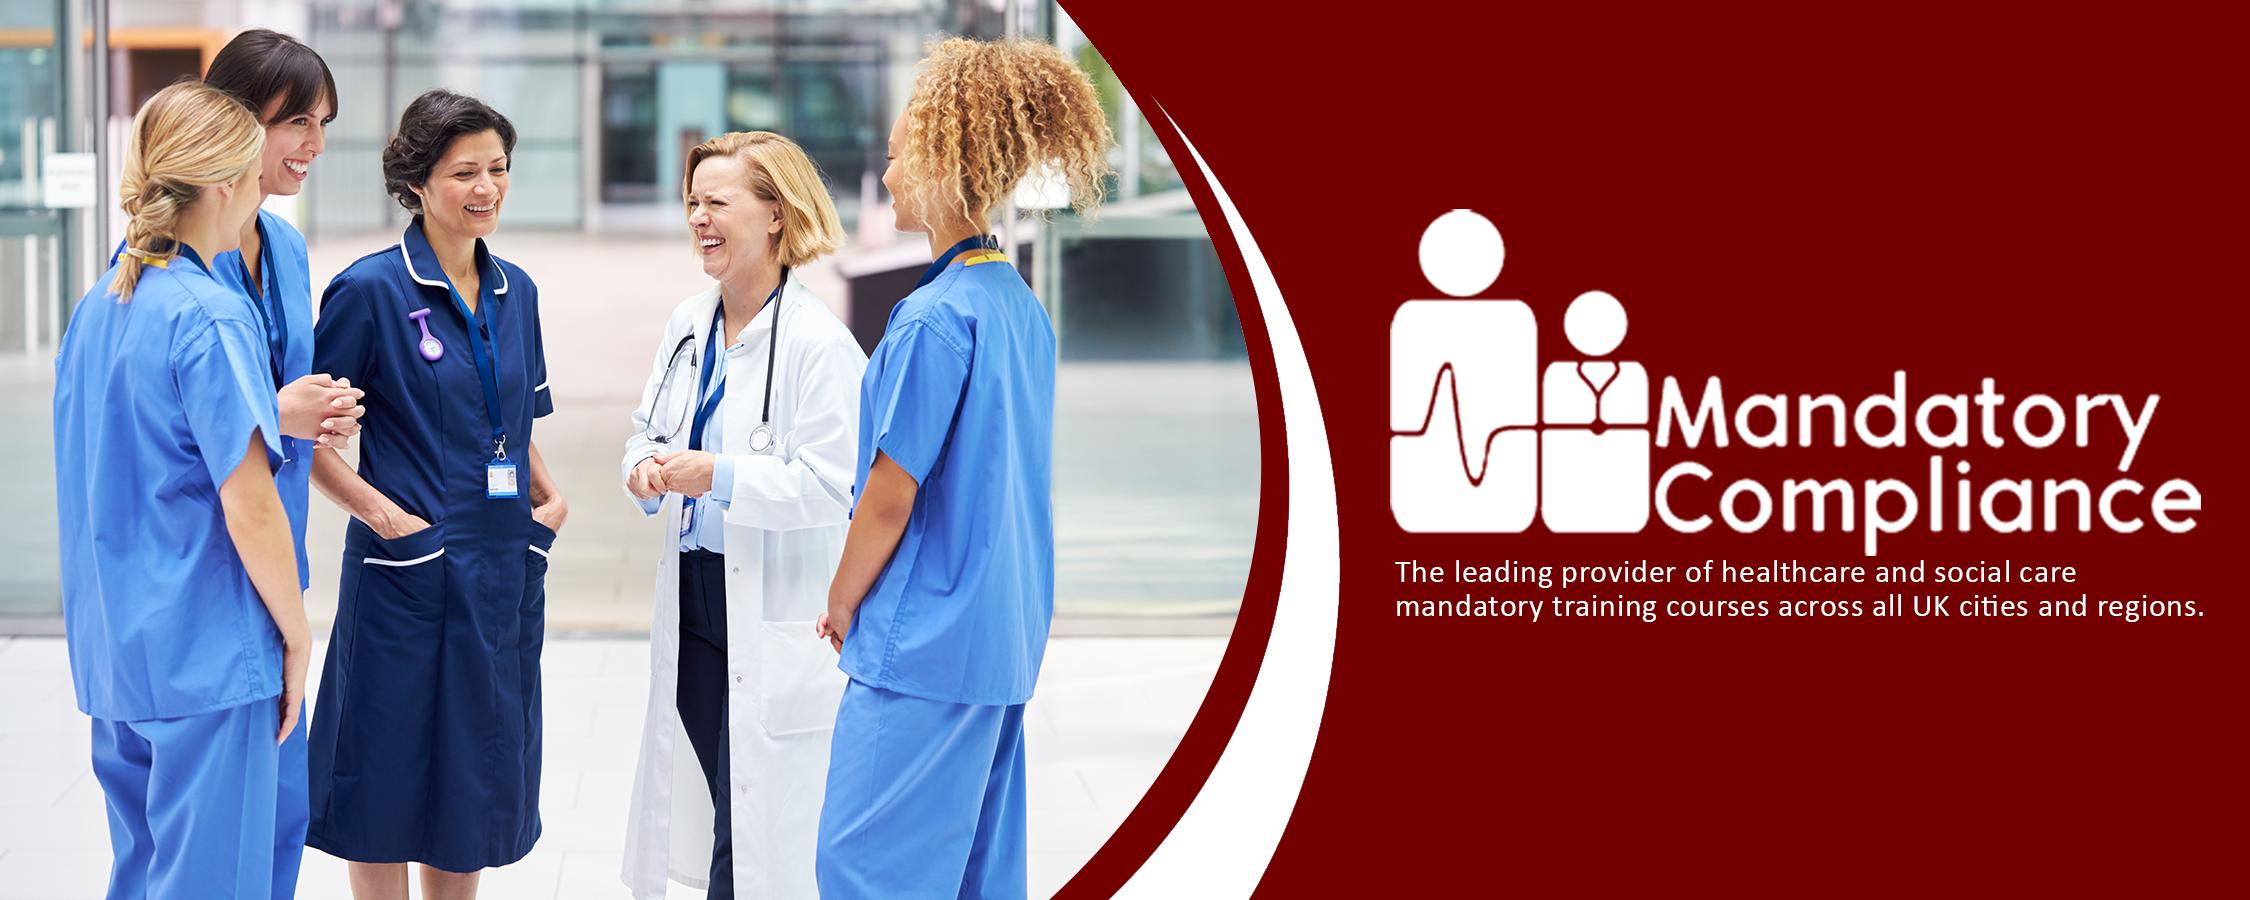 Life Coaching Essentials Training - E-Learning Courses - Mandatory Compliance UK -